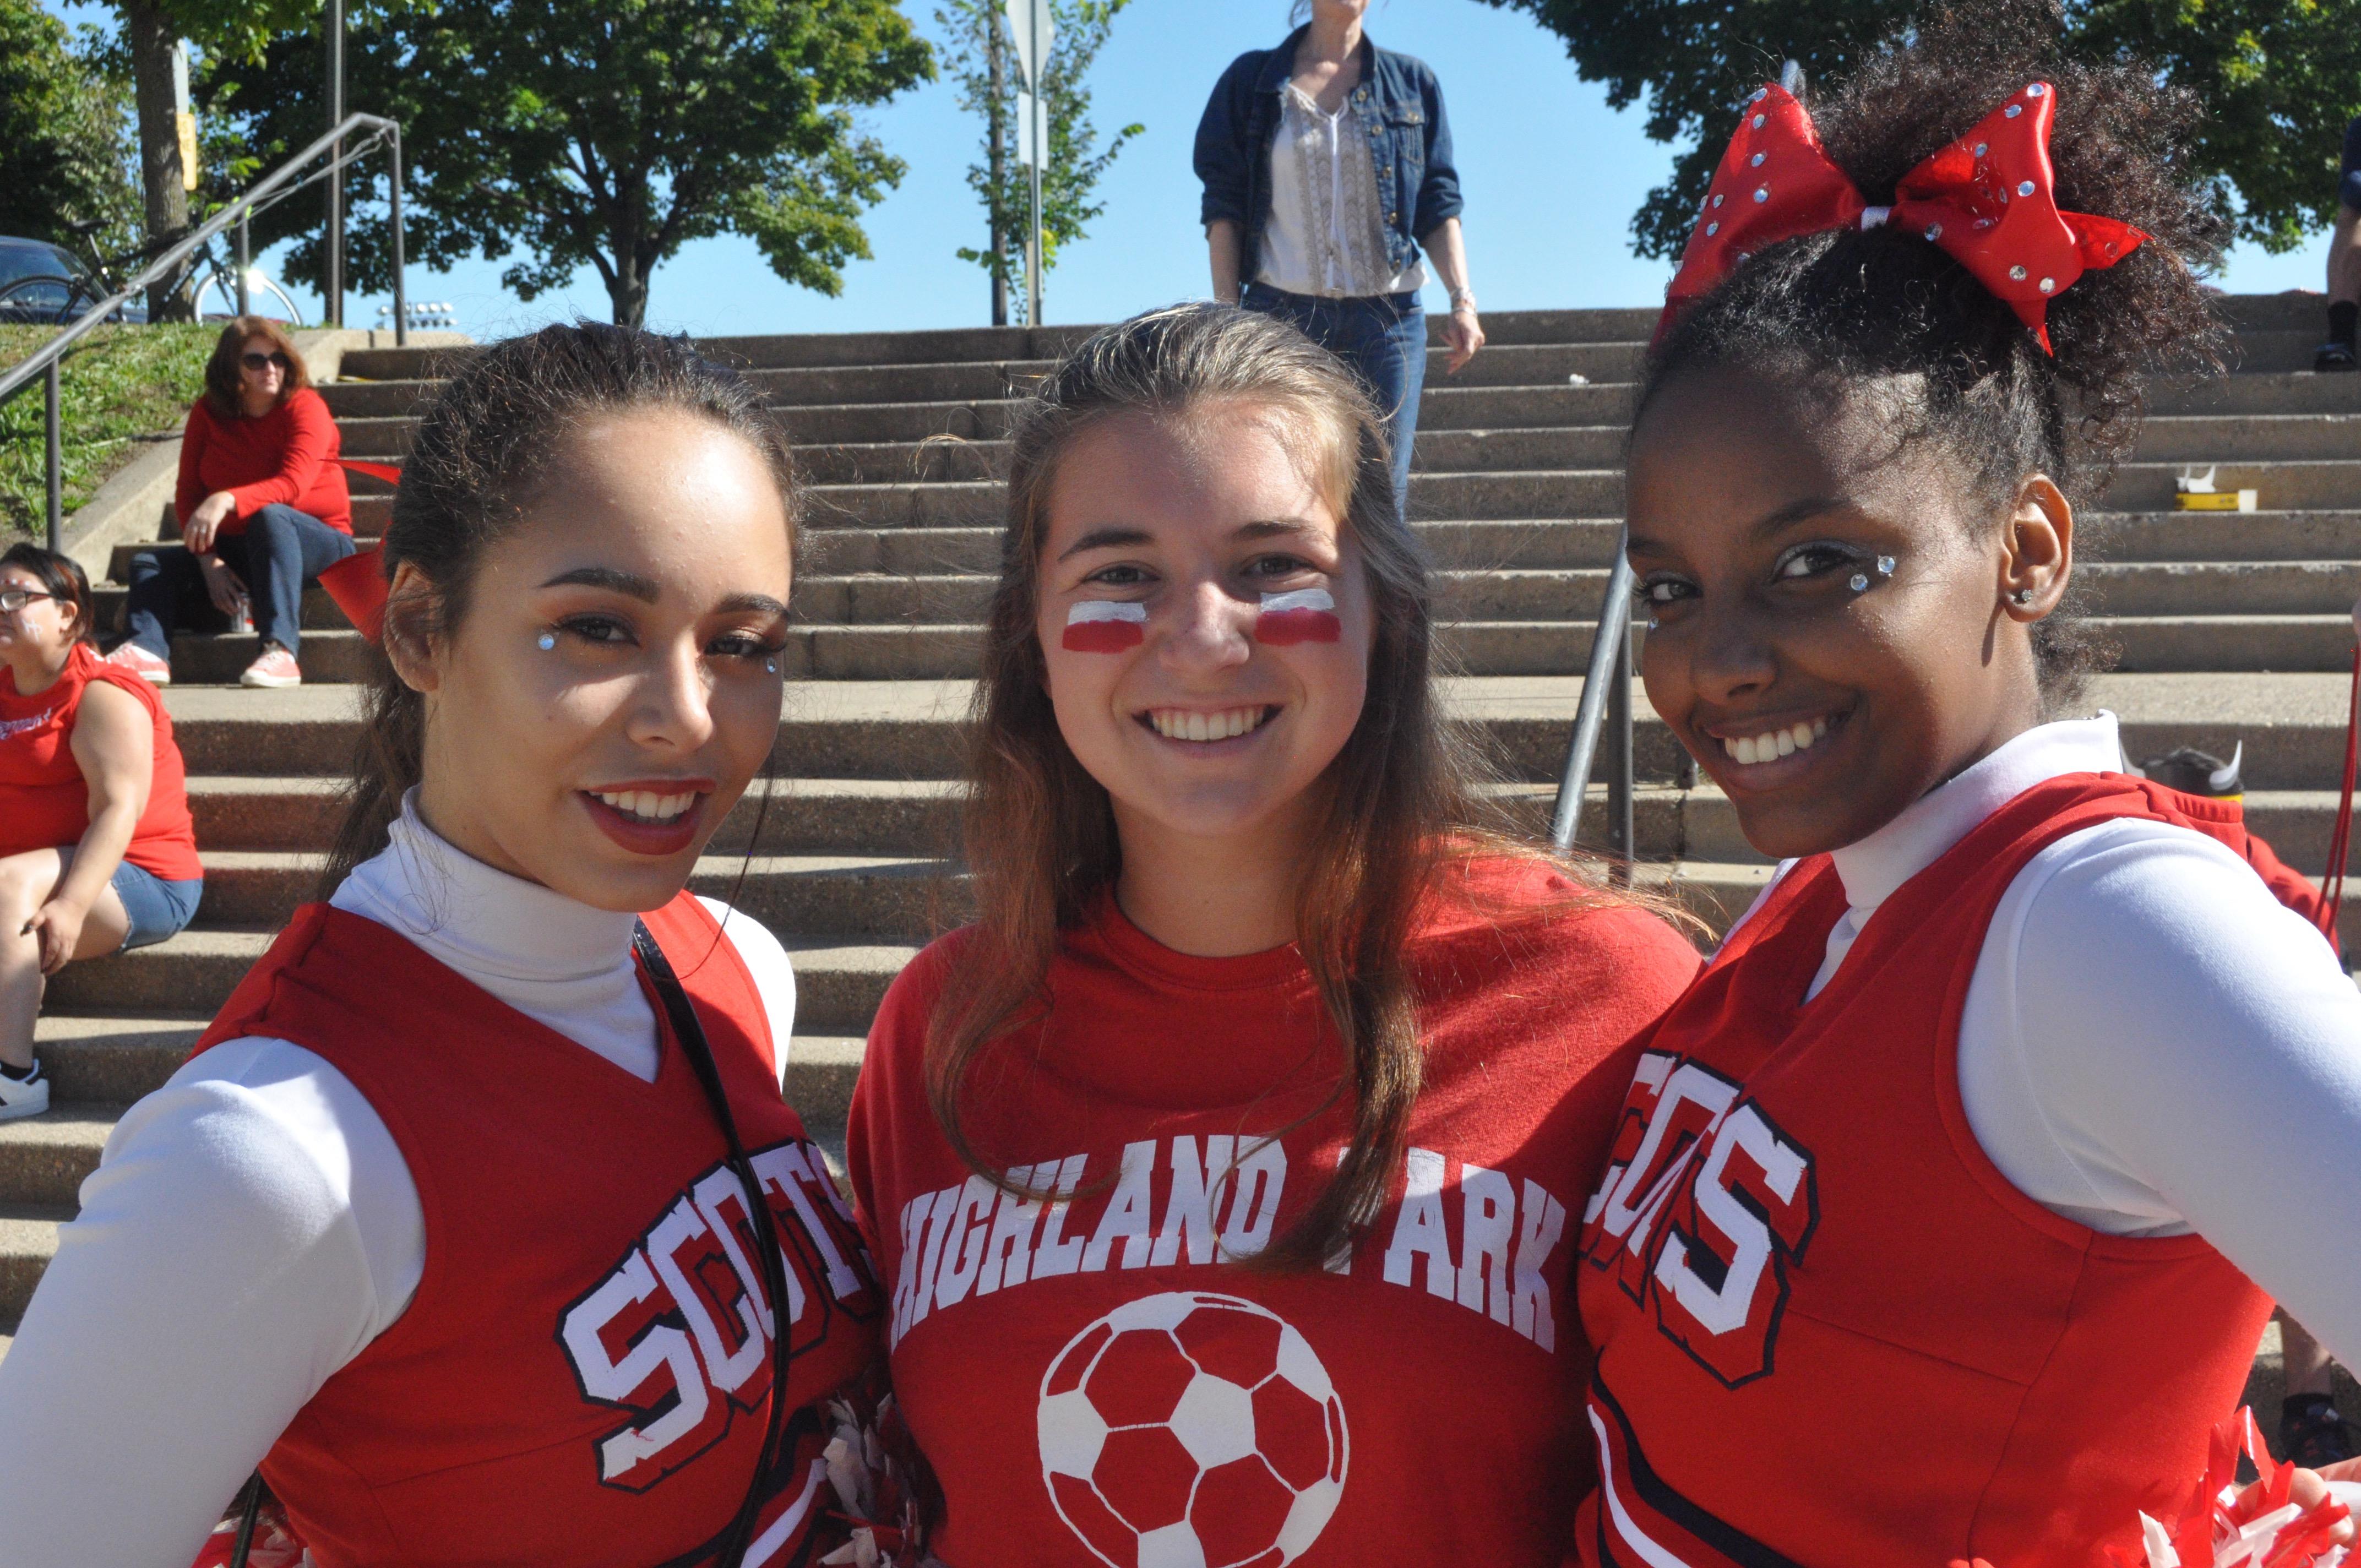 Highland Park Senior High School / Homepage